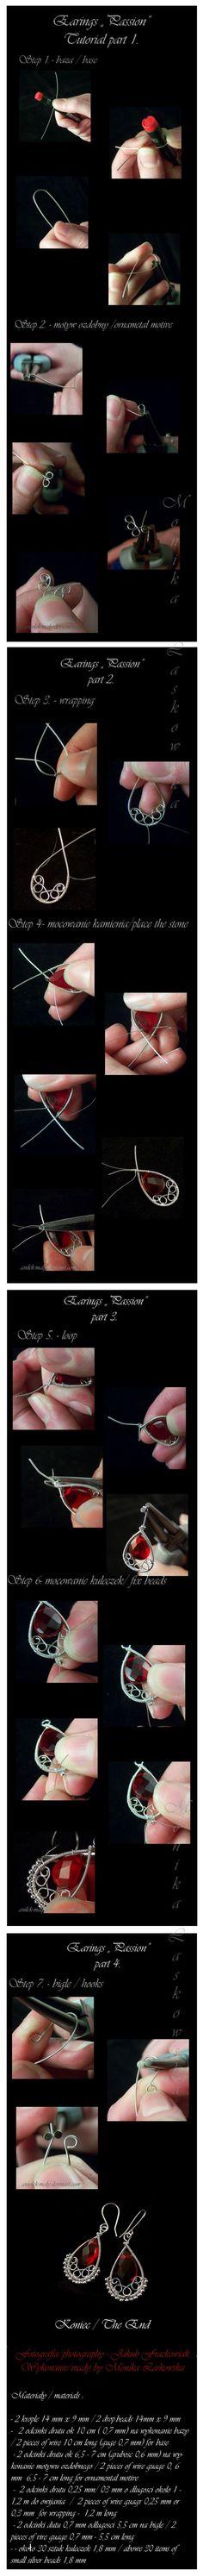 Wire wrapping tutorial via aniolek-maly.deviantart.com